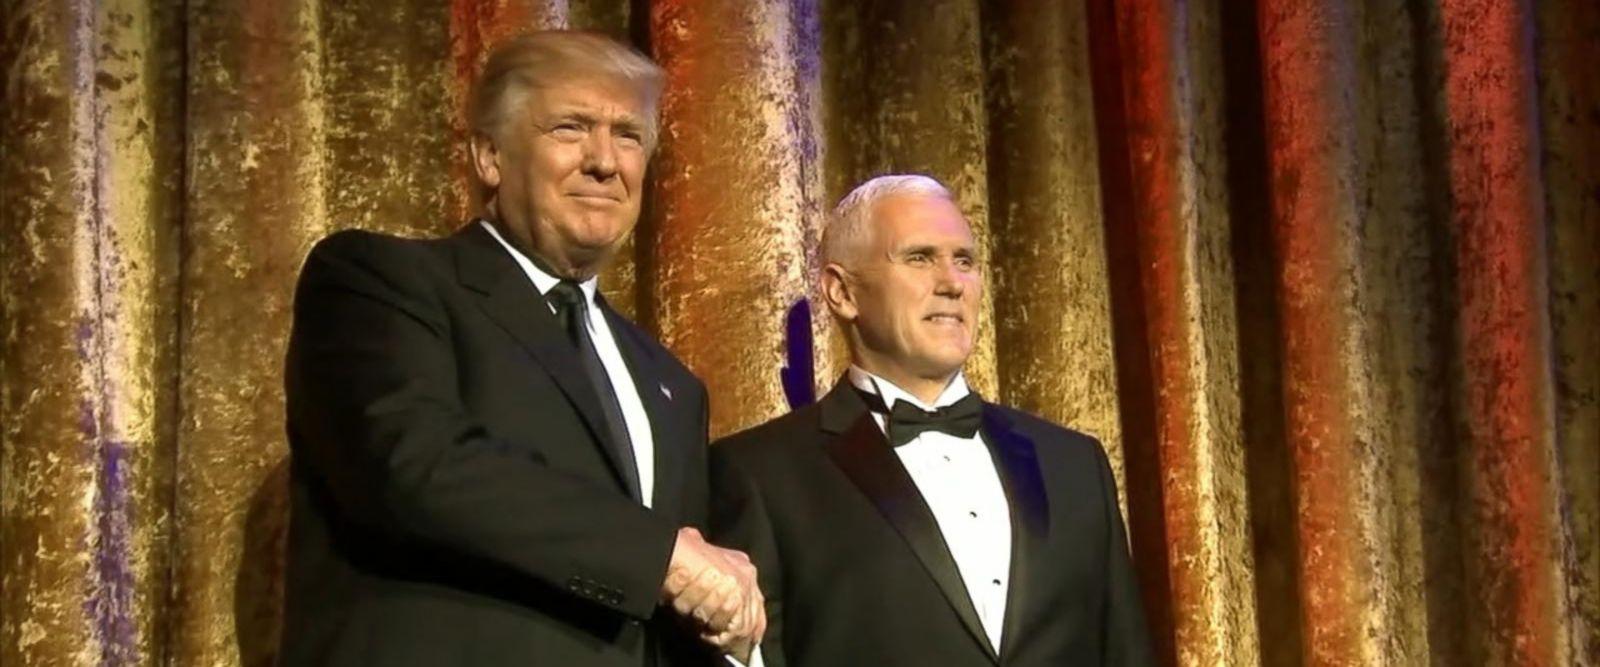 VIDEO: Trump Kicks Off Inauguration Festivities at Gala